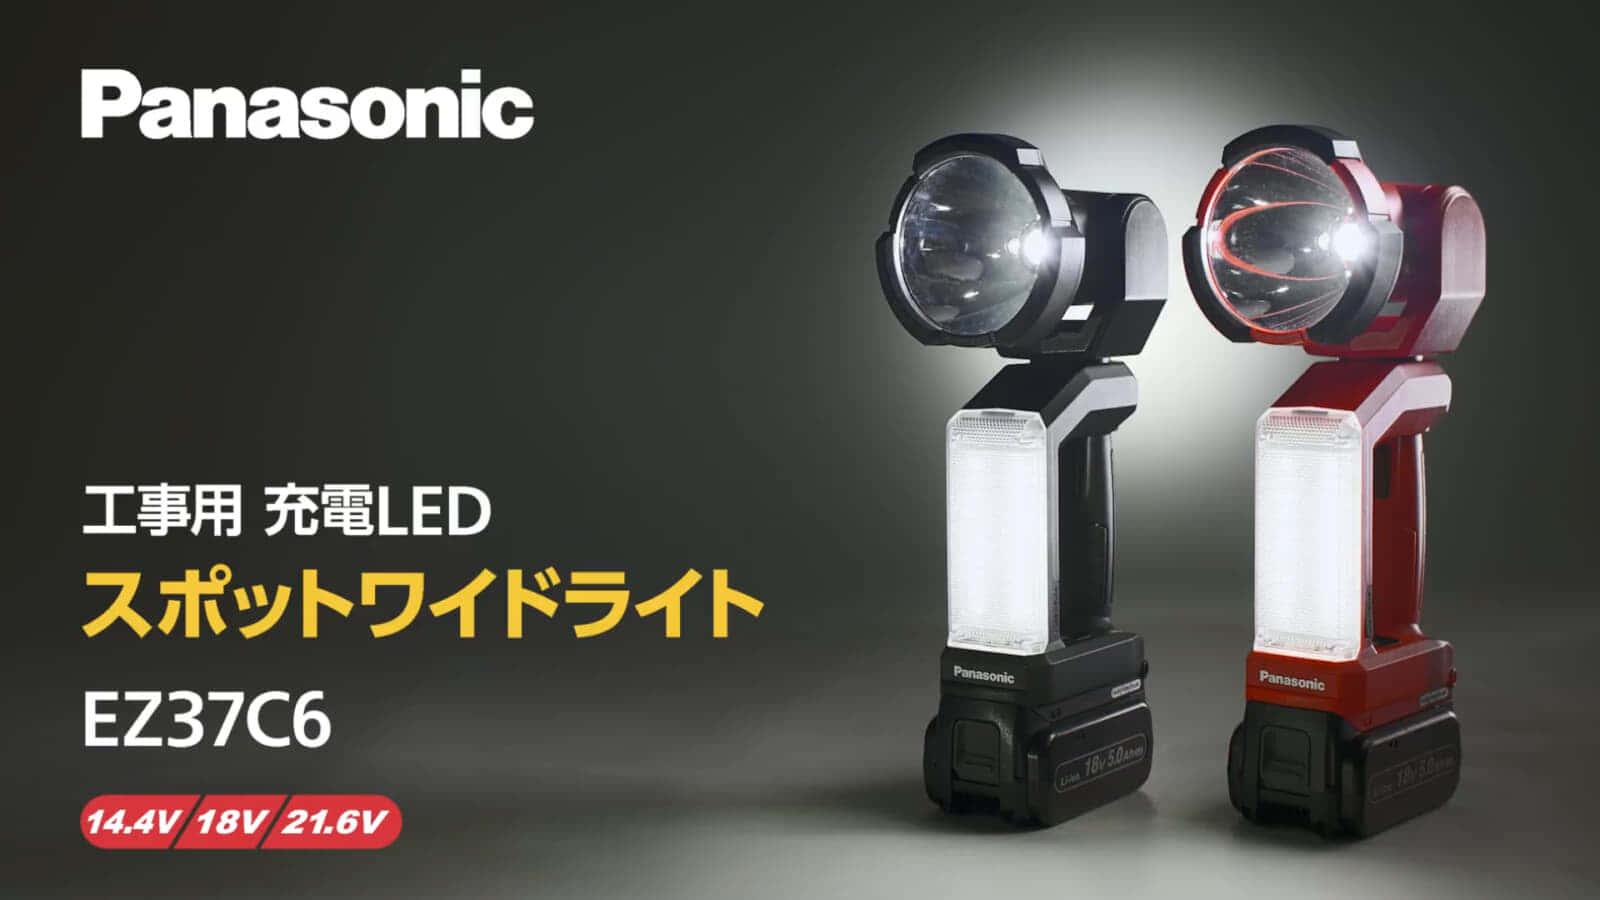 Panasonic EZ37C6 工事用充電LEDスポットワイドライトを発売